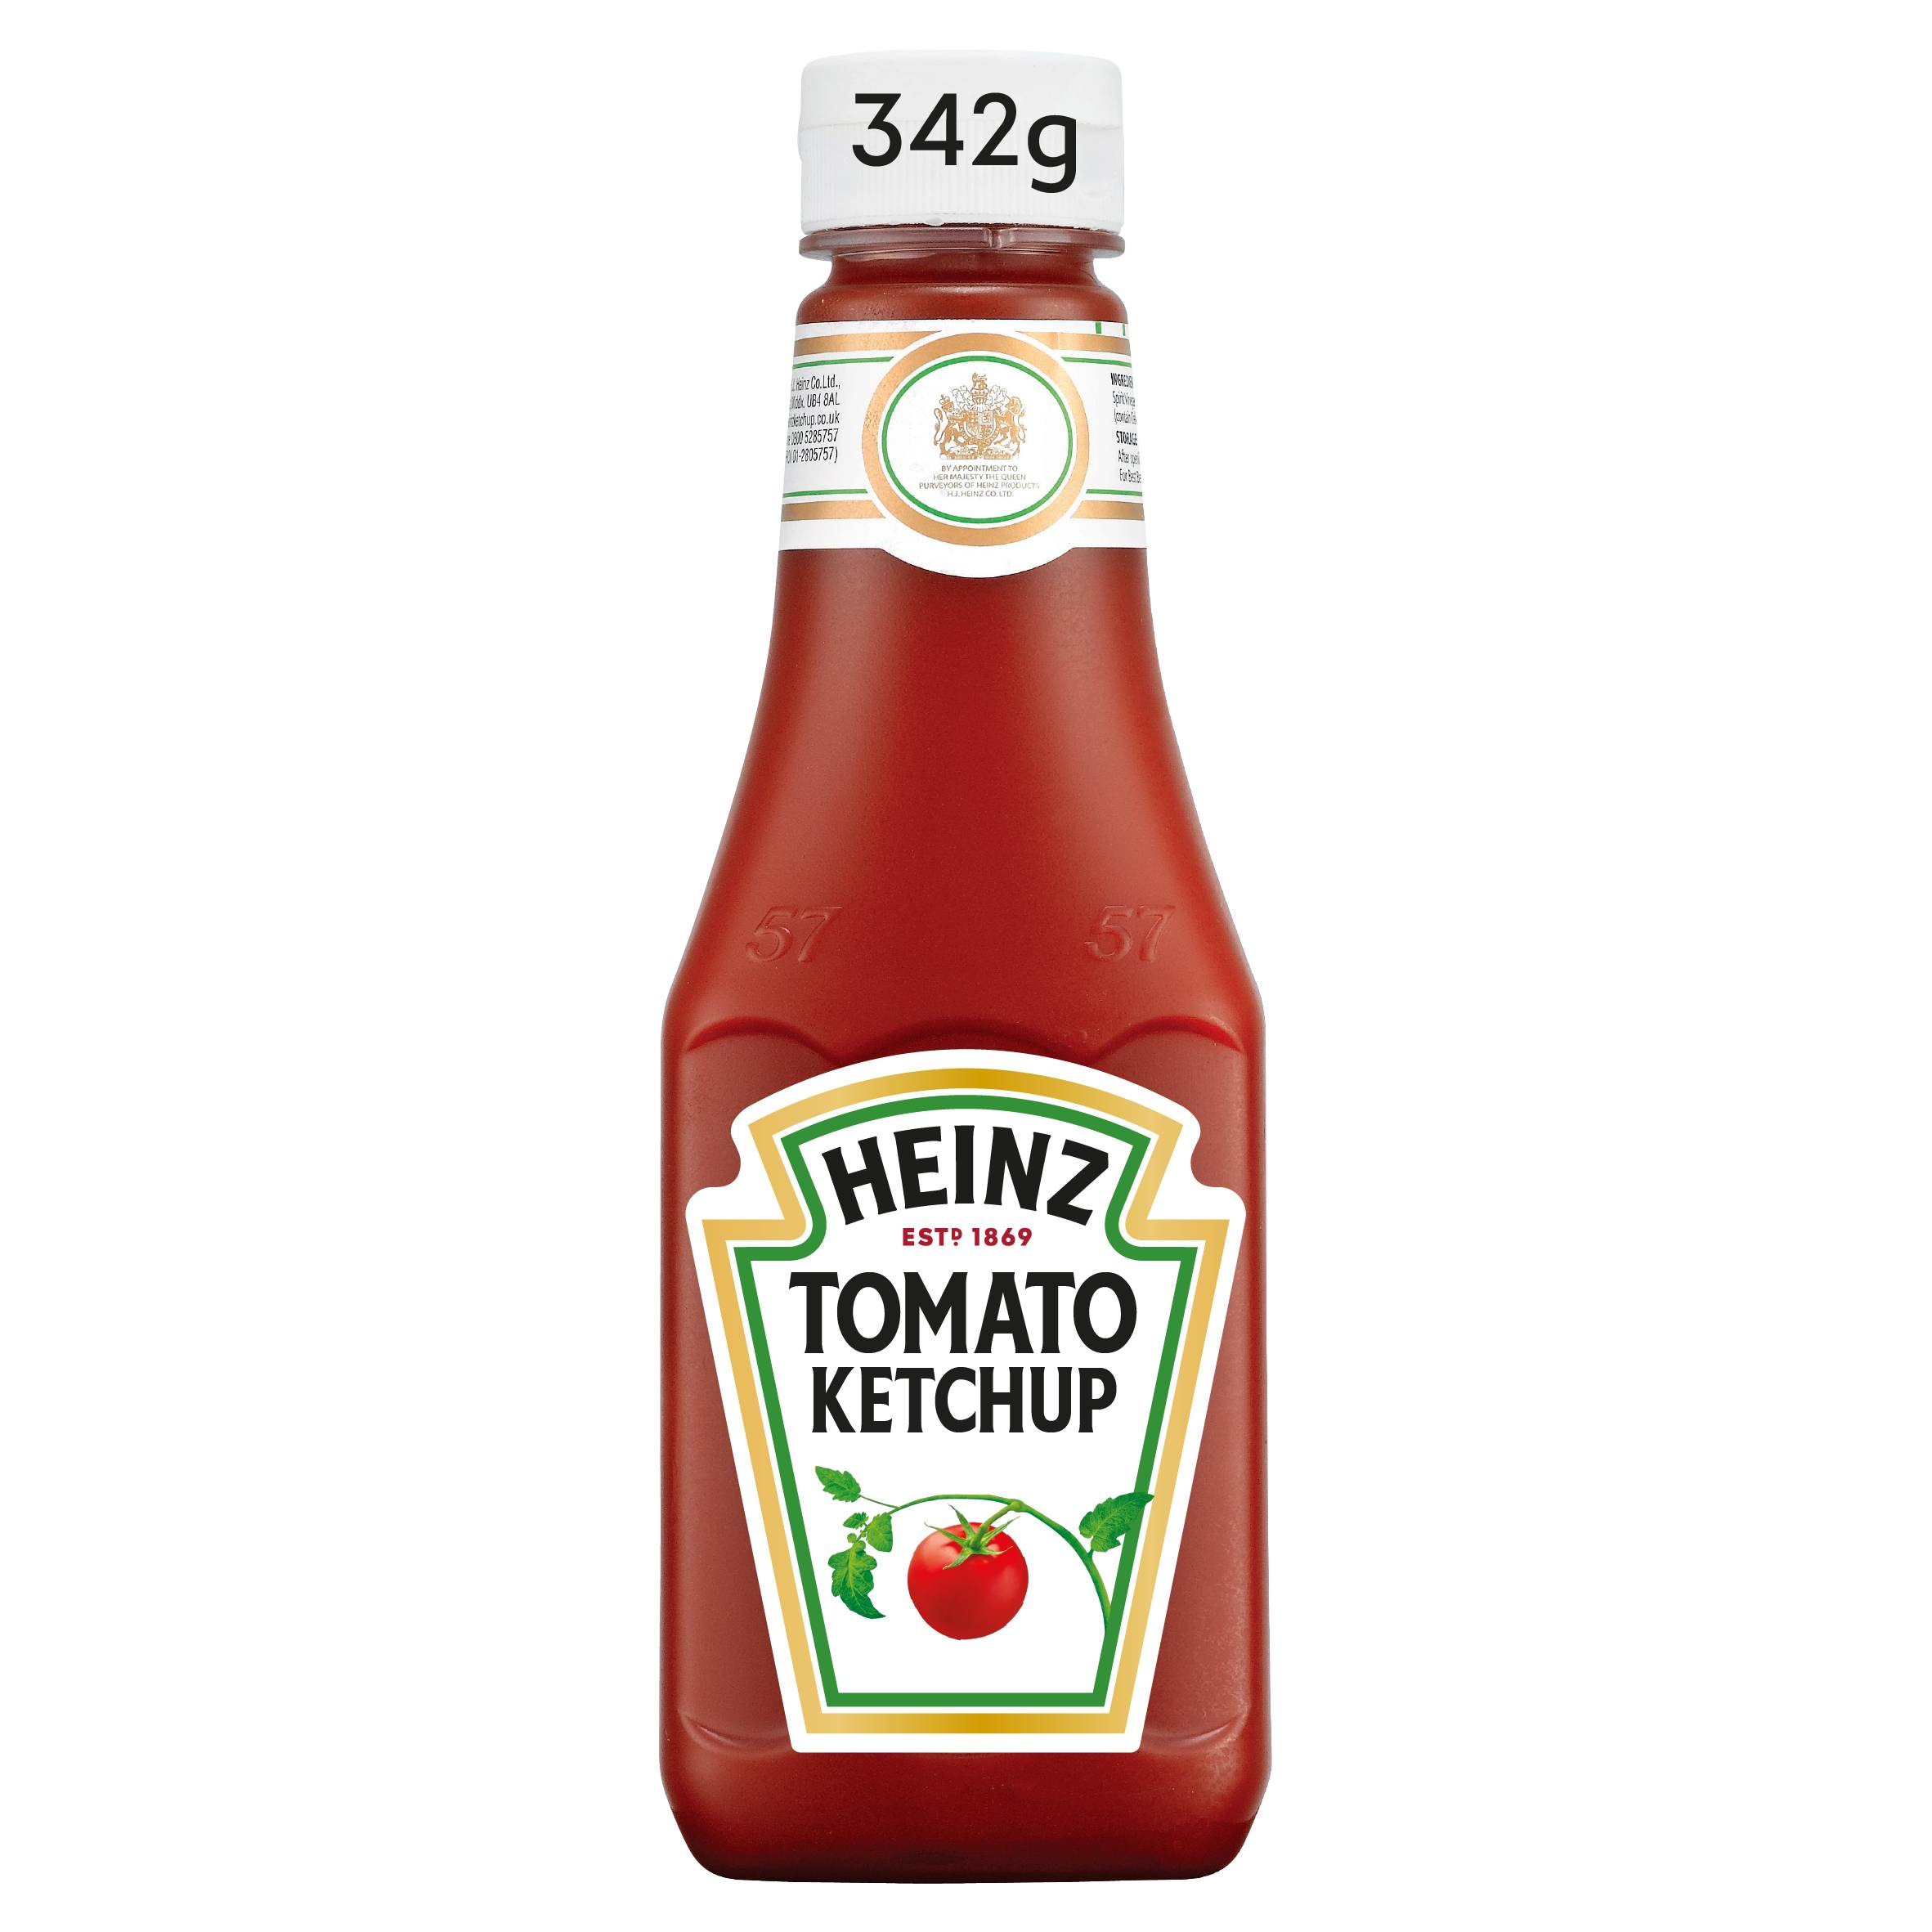 Ketchup Heinz 342g plastikowa butelka mała image